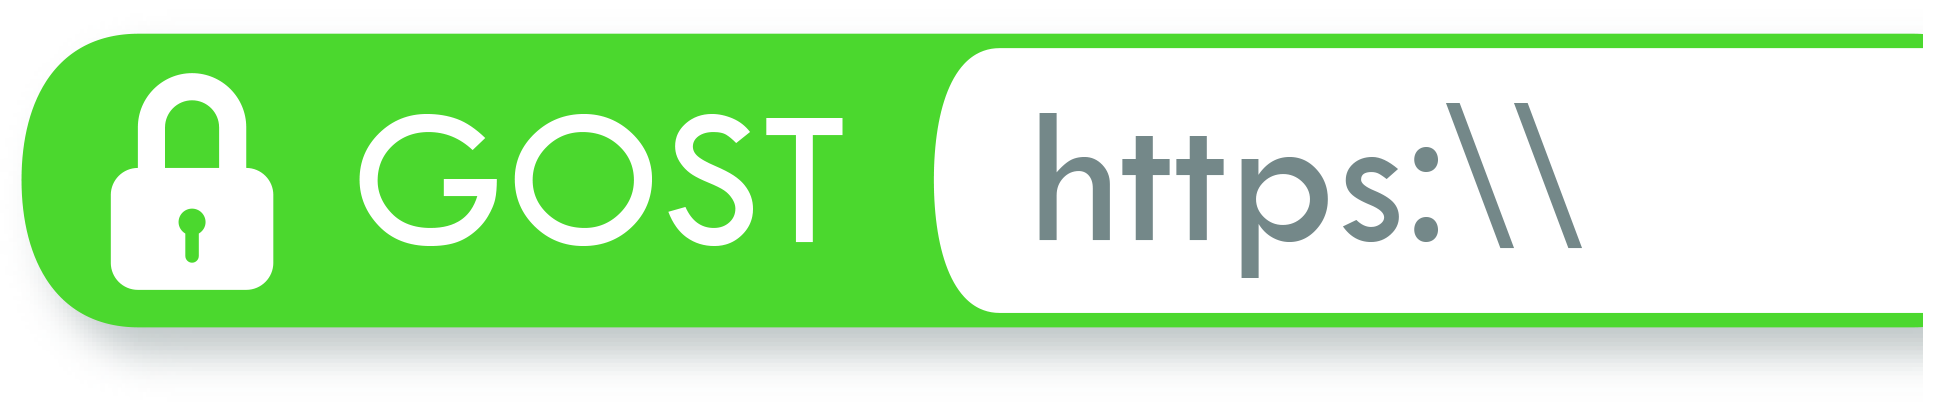 TLS 1.2 и новый ГОСТ - 1